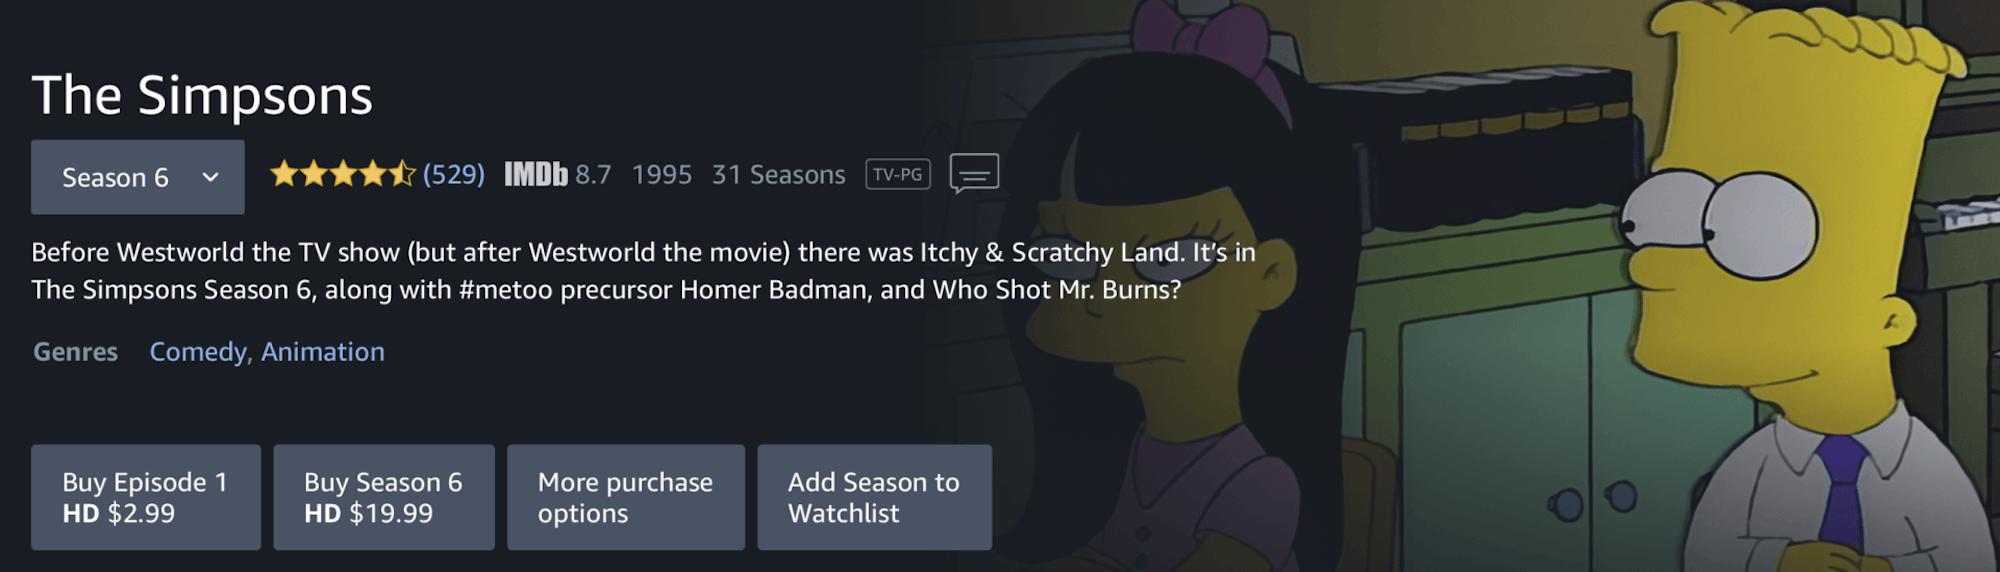 watch the simpsons season 31 on Amazon